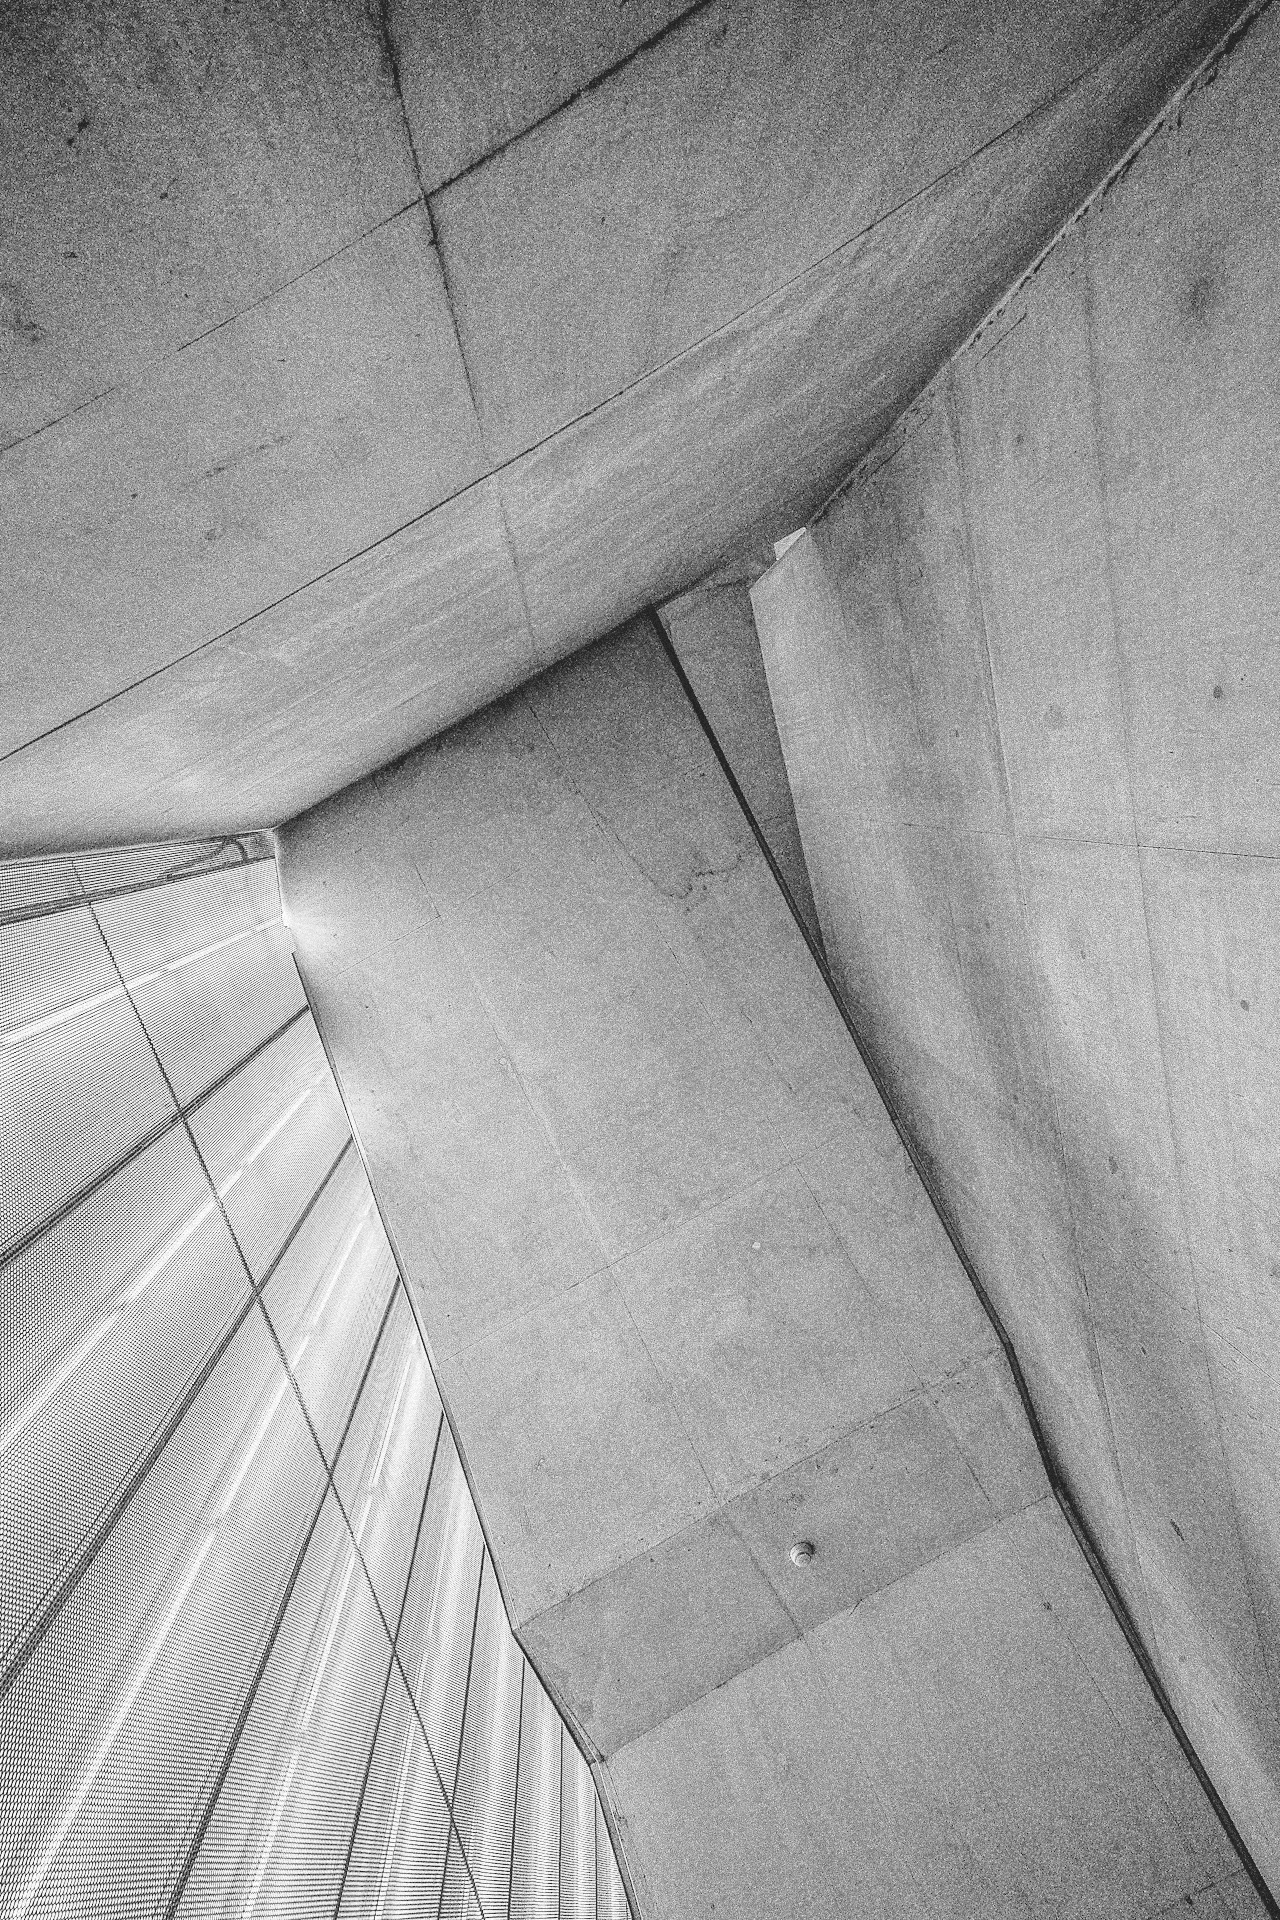 10-Aniversario-Casa-da-Musica-Porto-Reportagem-Fotografica-Photographic-Coverage-Fotografia-Photography-Arquitectura-Architecture-Rem-Koolhaas-bonjourmolotov-24N2.jpg